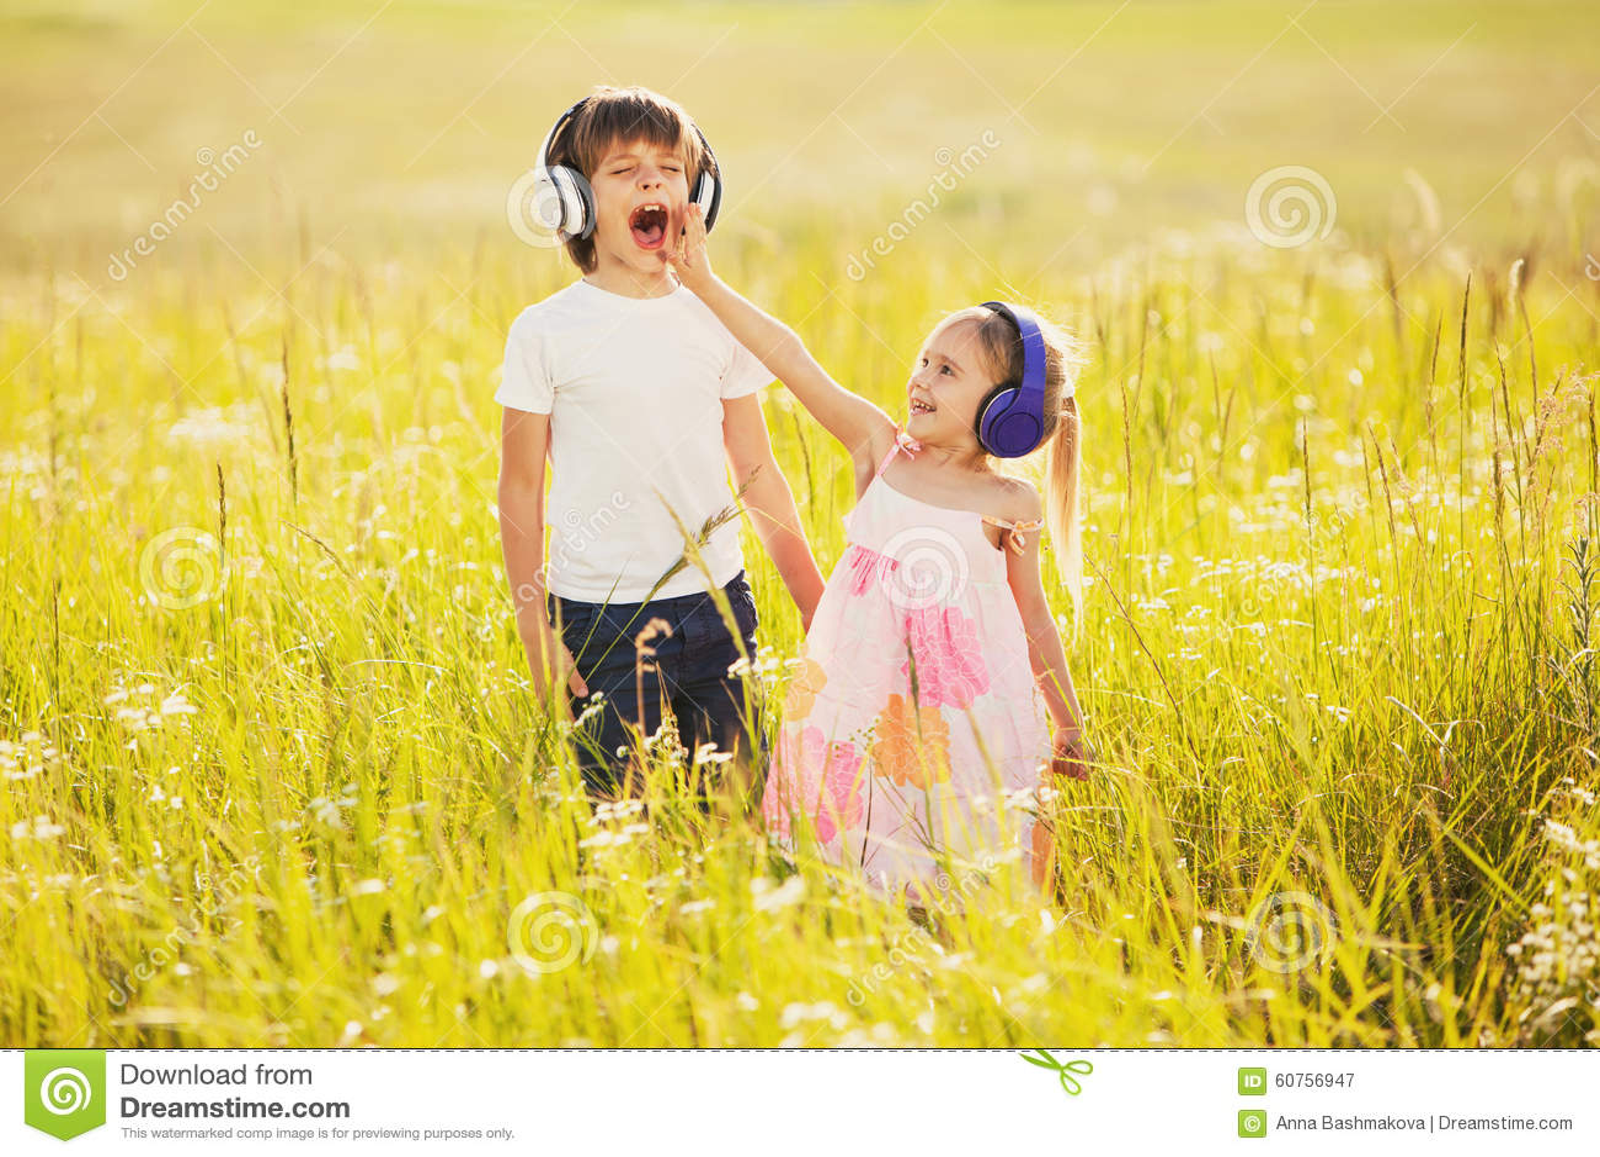 Funny Kids Listen Music On Headphones Stock Image - Image of